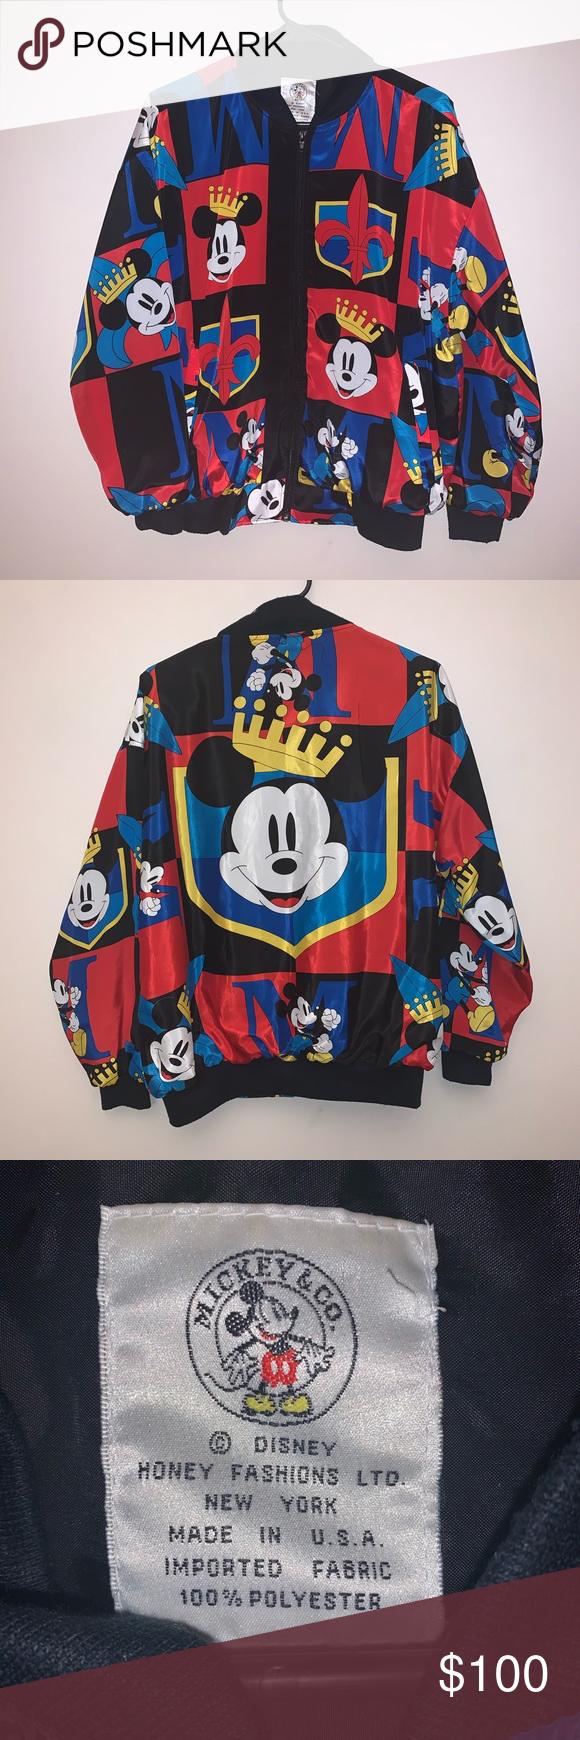 Vintage Mickey Mouse Bomber Jacket Vintage Mickey Bomber Jacket Vintage Mickey Mouse [ 1740 x 580 Pixel ]